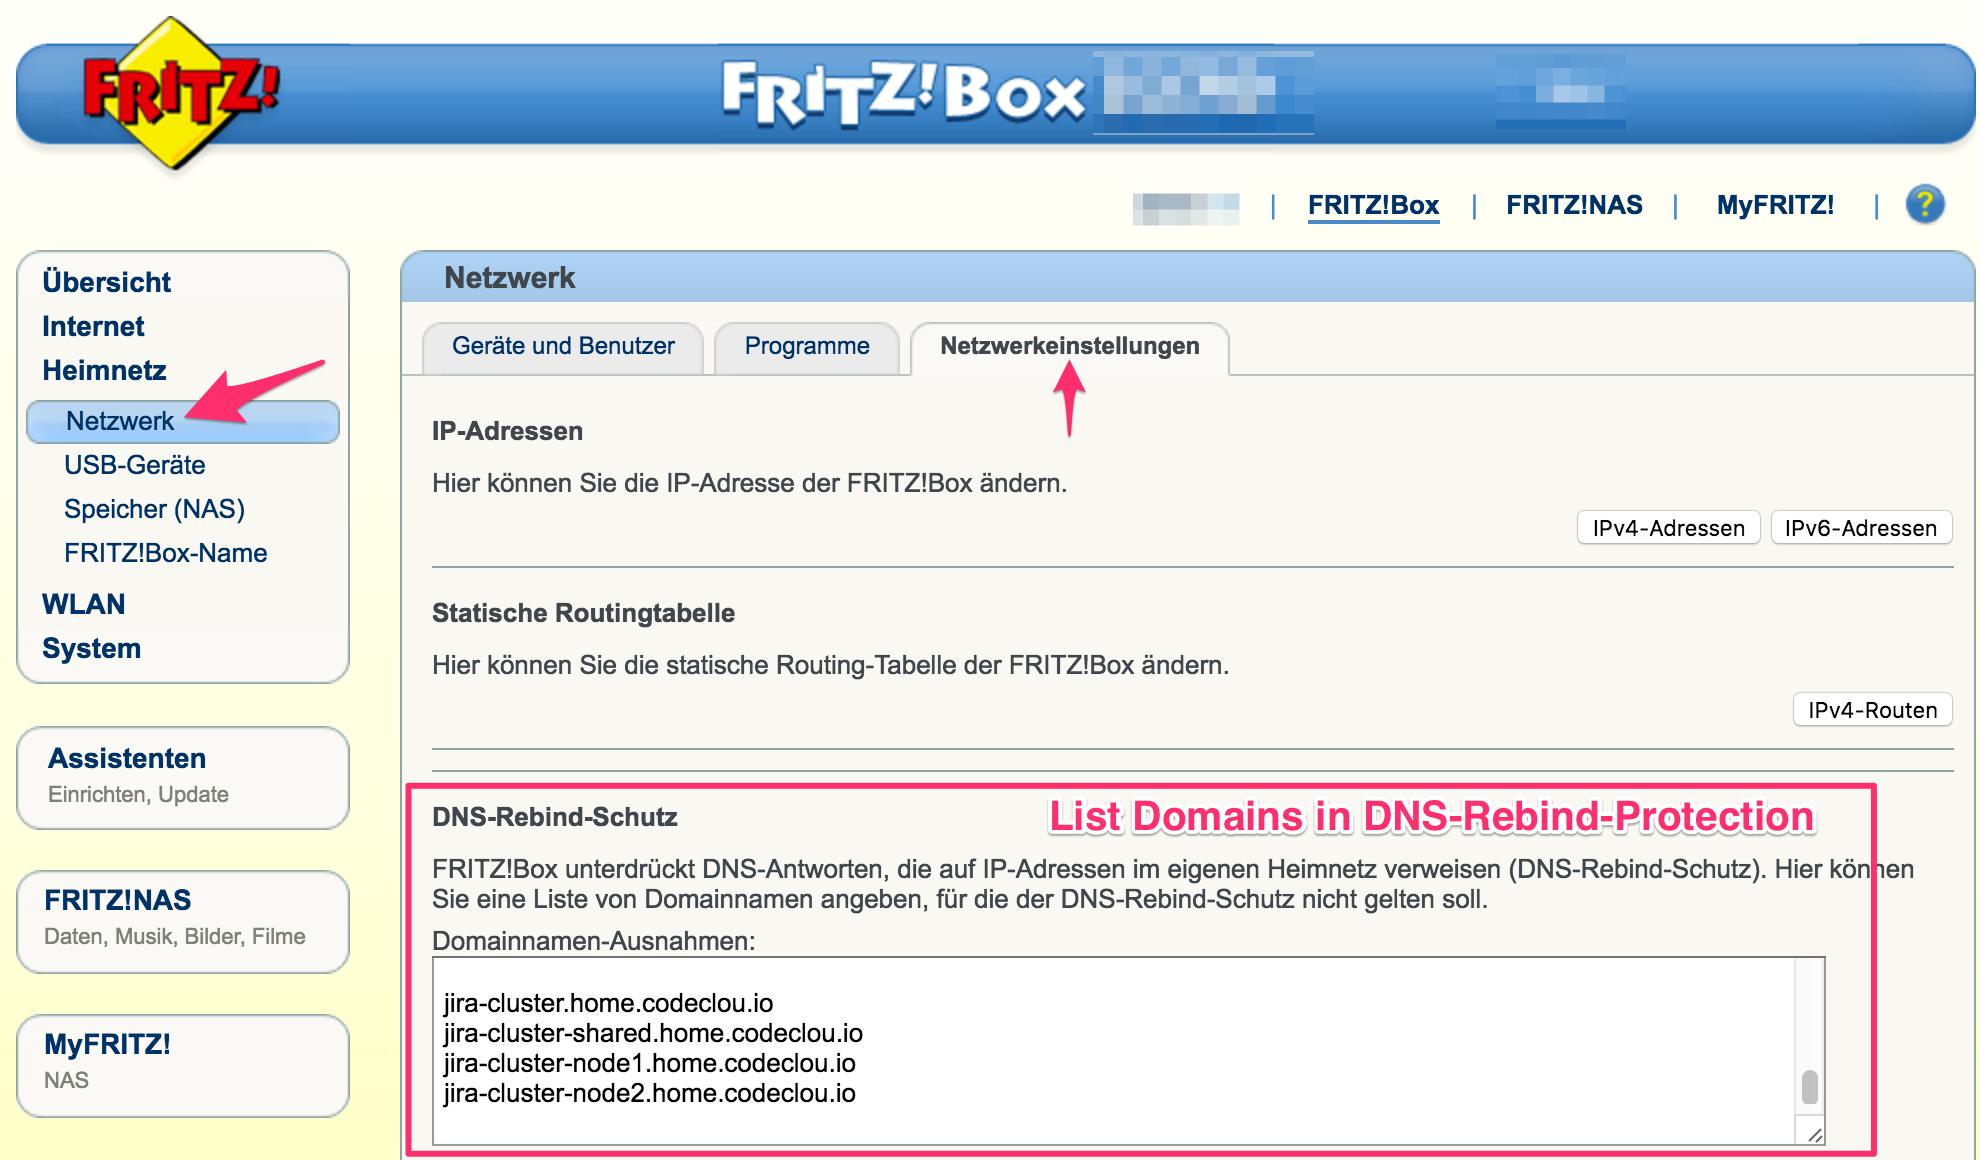 FRITZ!Box DNS Rebind Protection